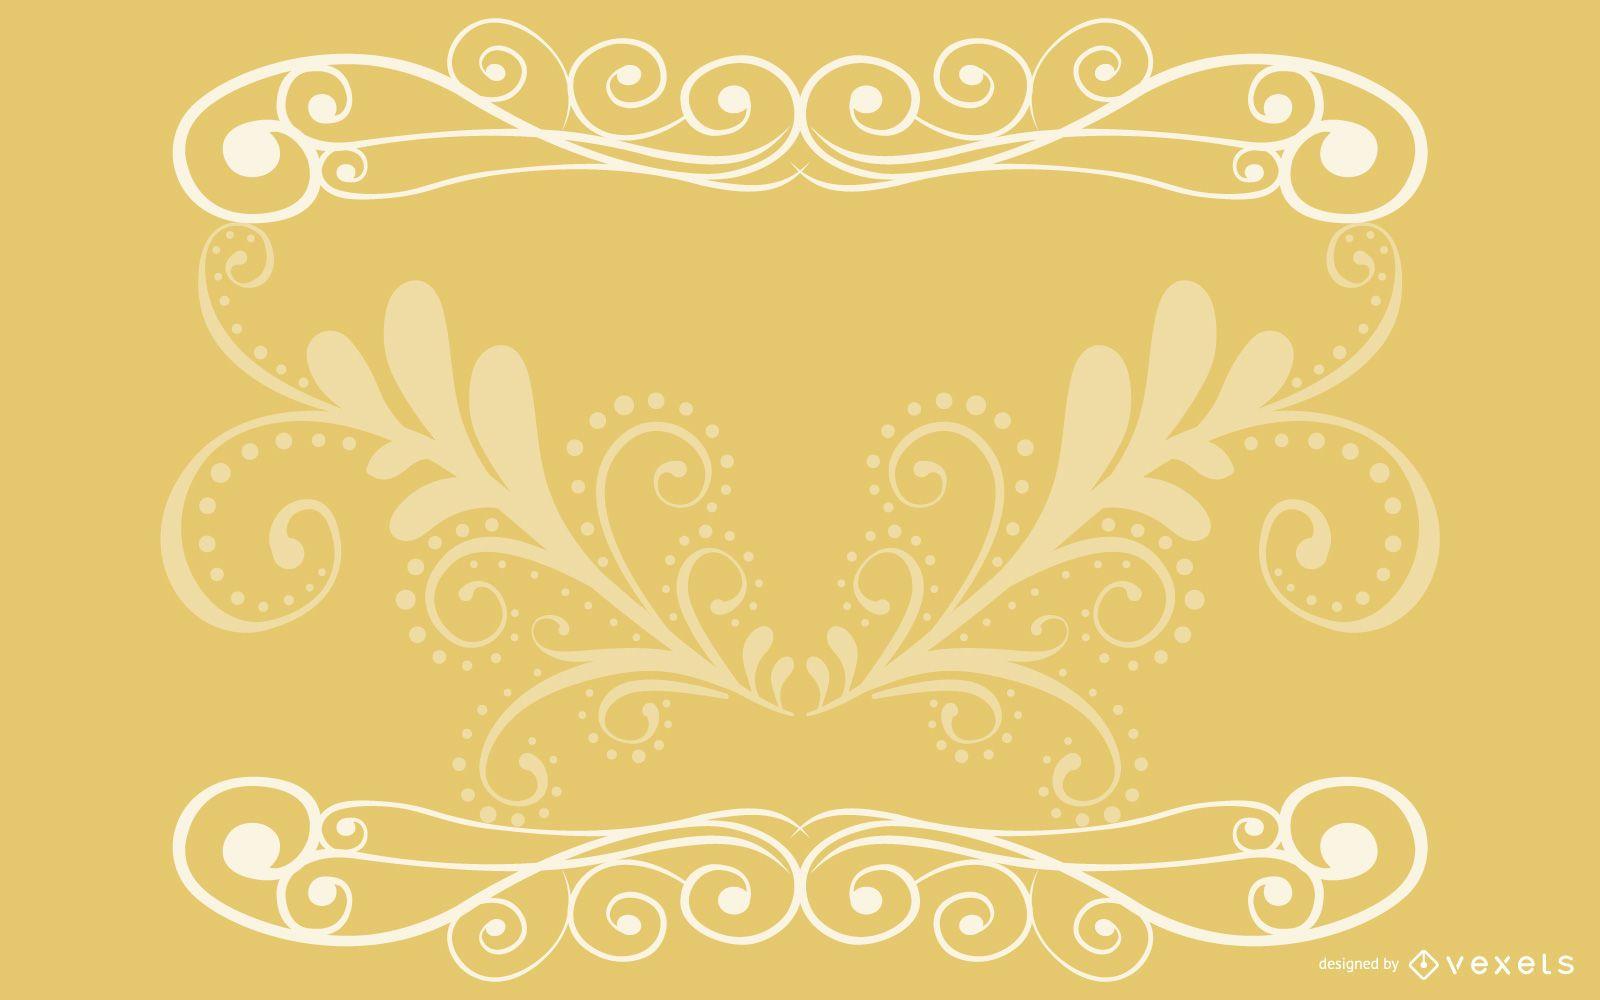 Floral Swirls Elegant Vintage Card